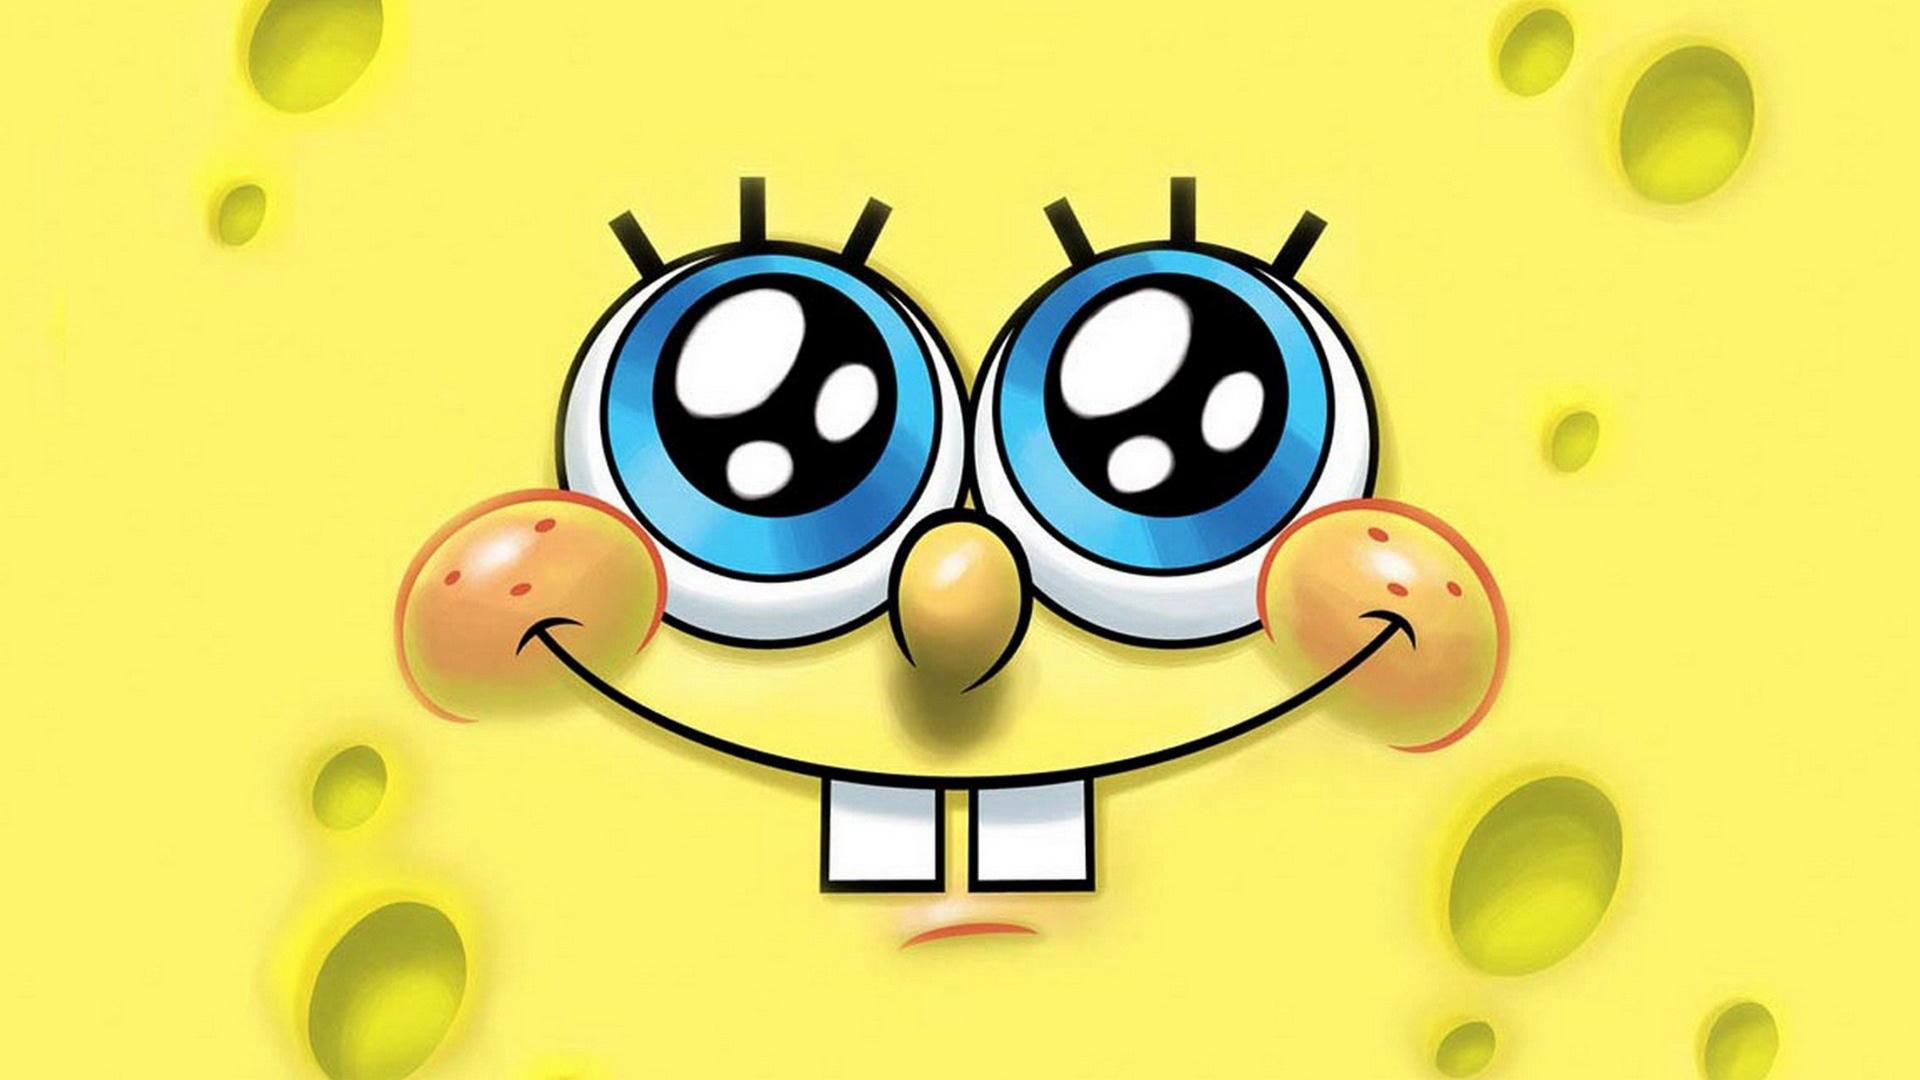 1 SpongeBob SquarePants: Revenge Of The Flying Dutchman HD Wallpapers   Backgrounds - Wallpaper Abyss